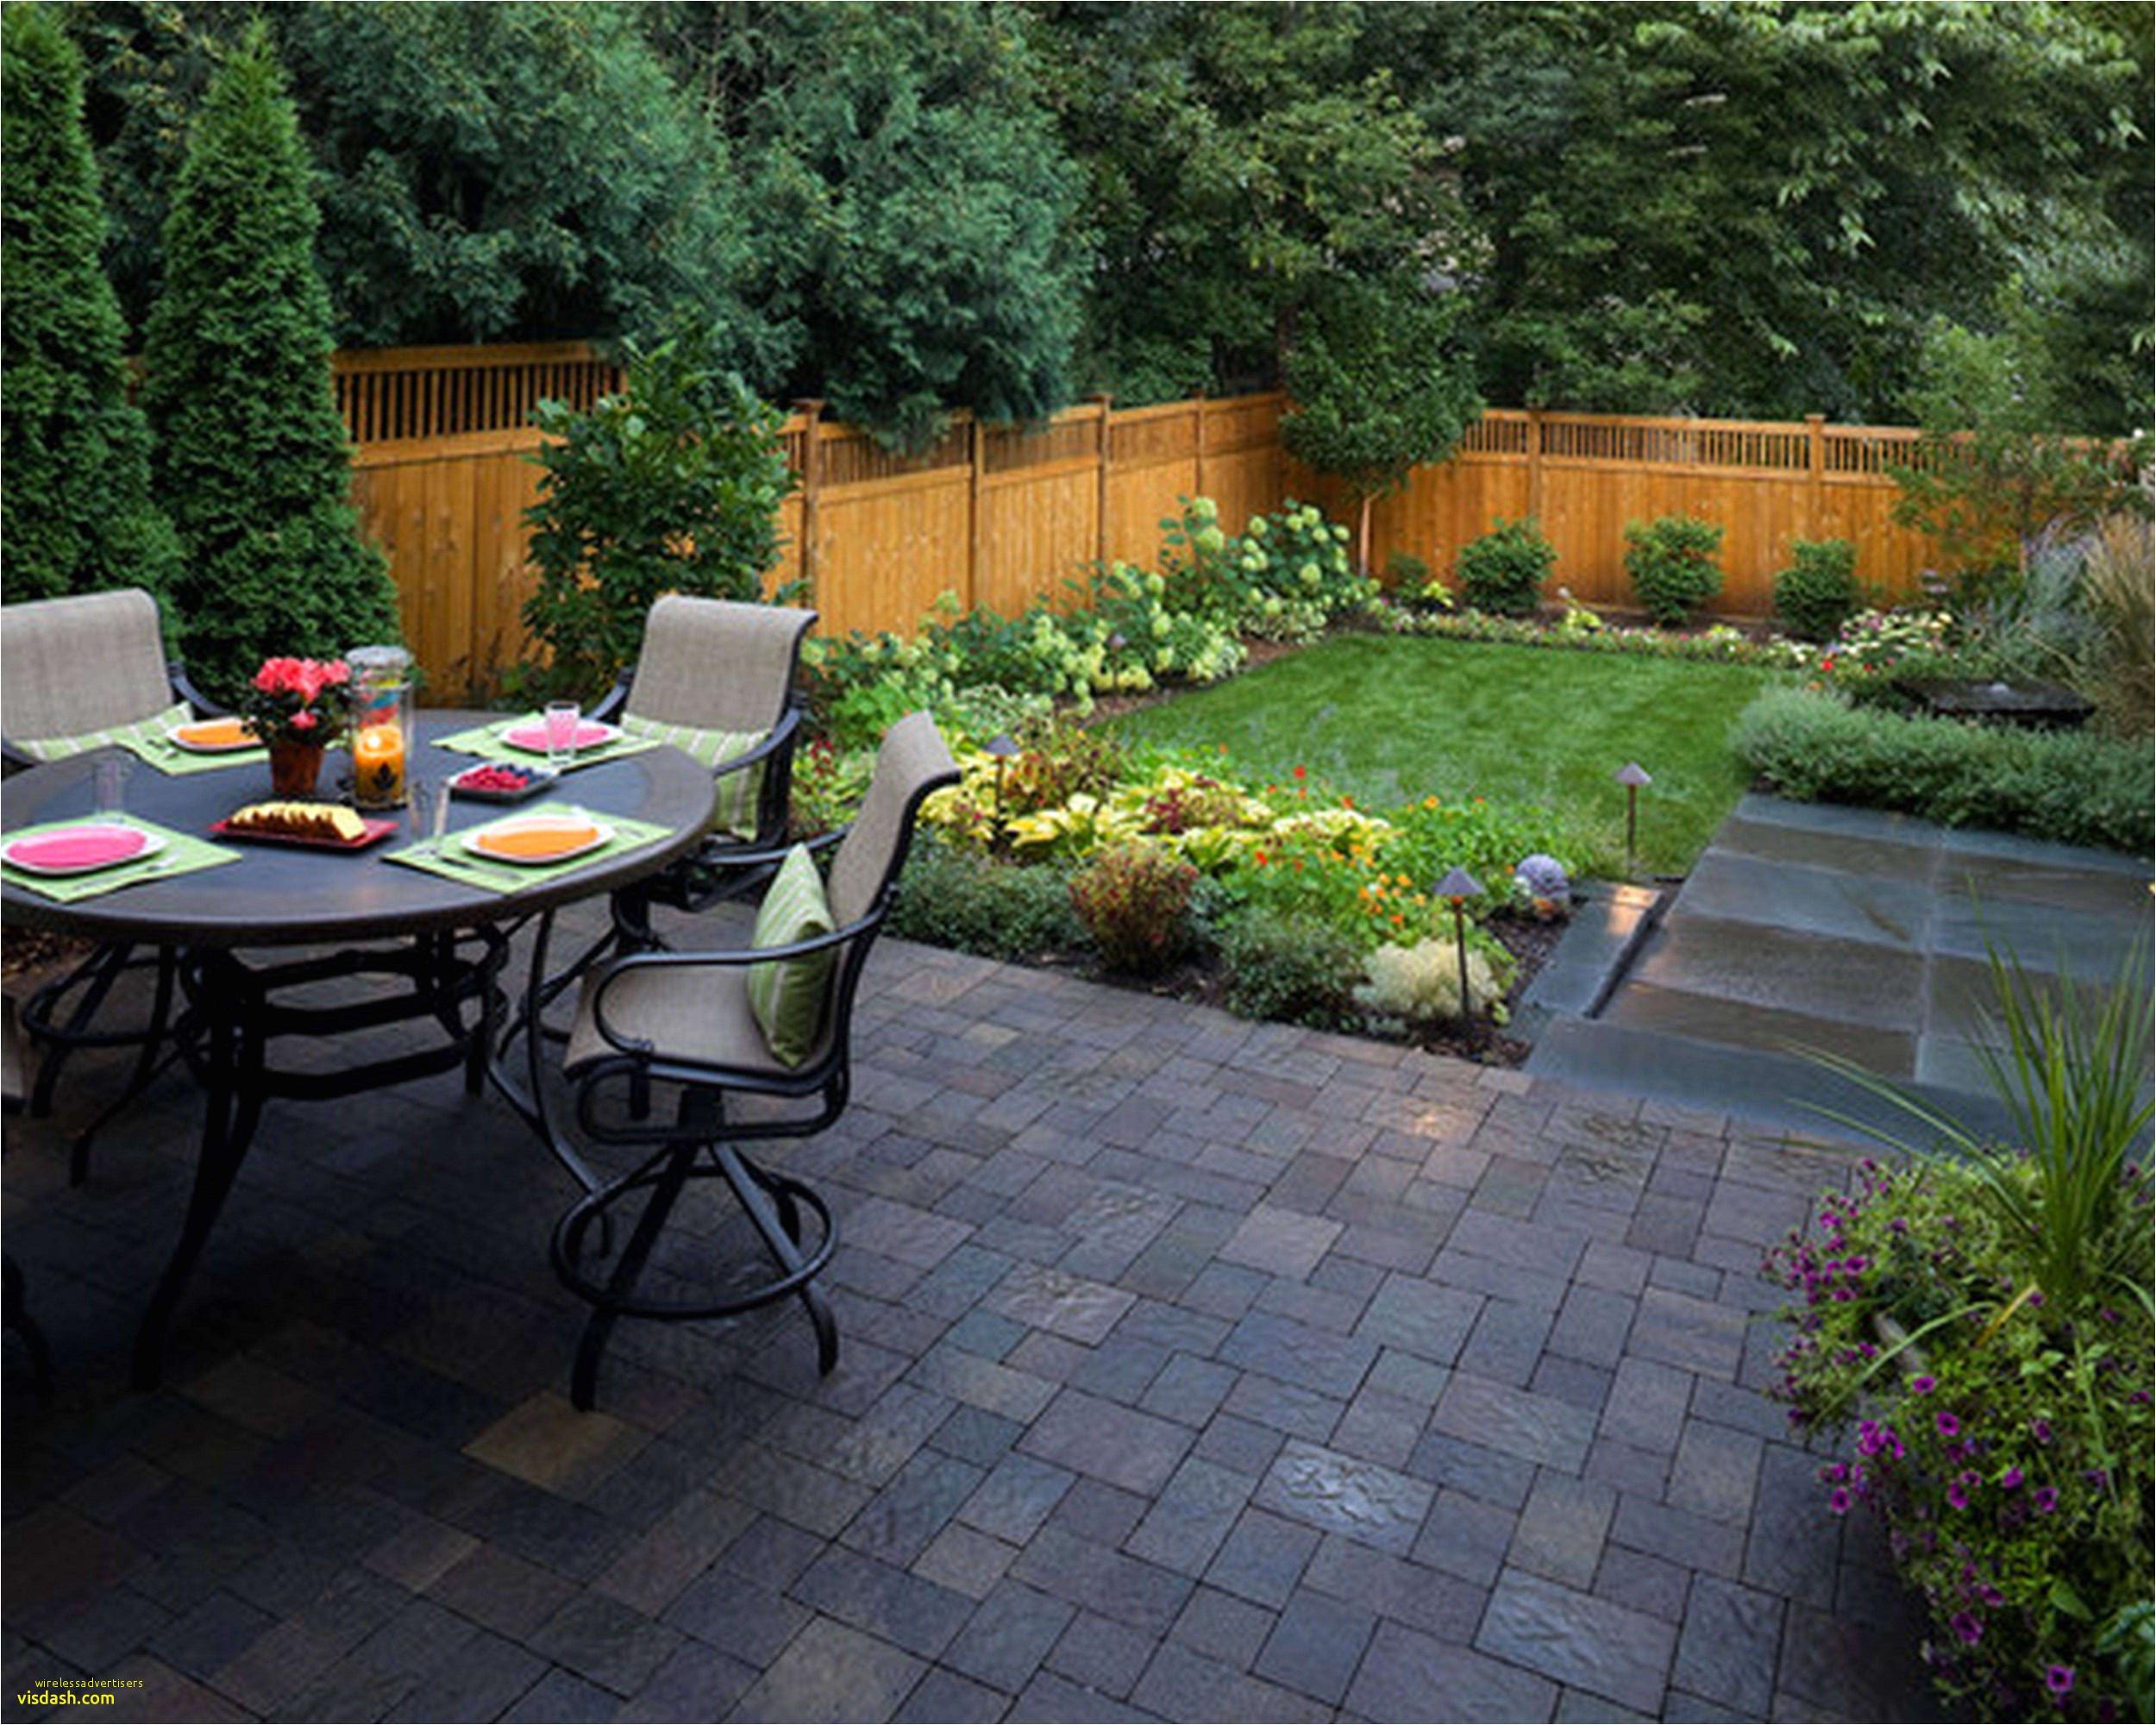 small garden patio ideas uk sensational inspirational backyard design ideas uk